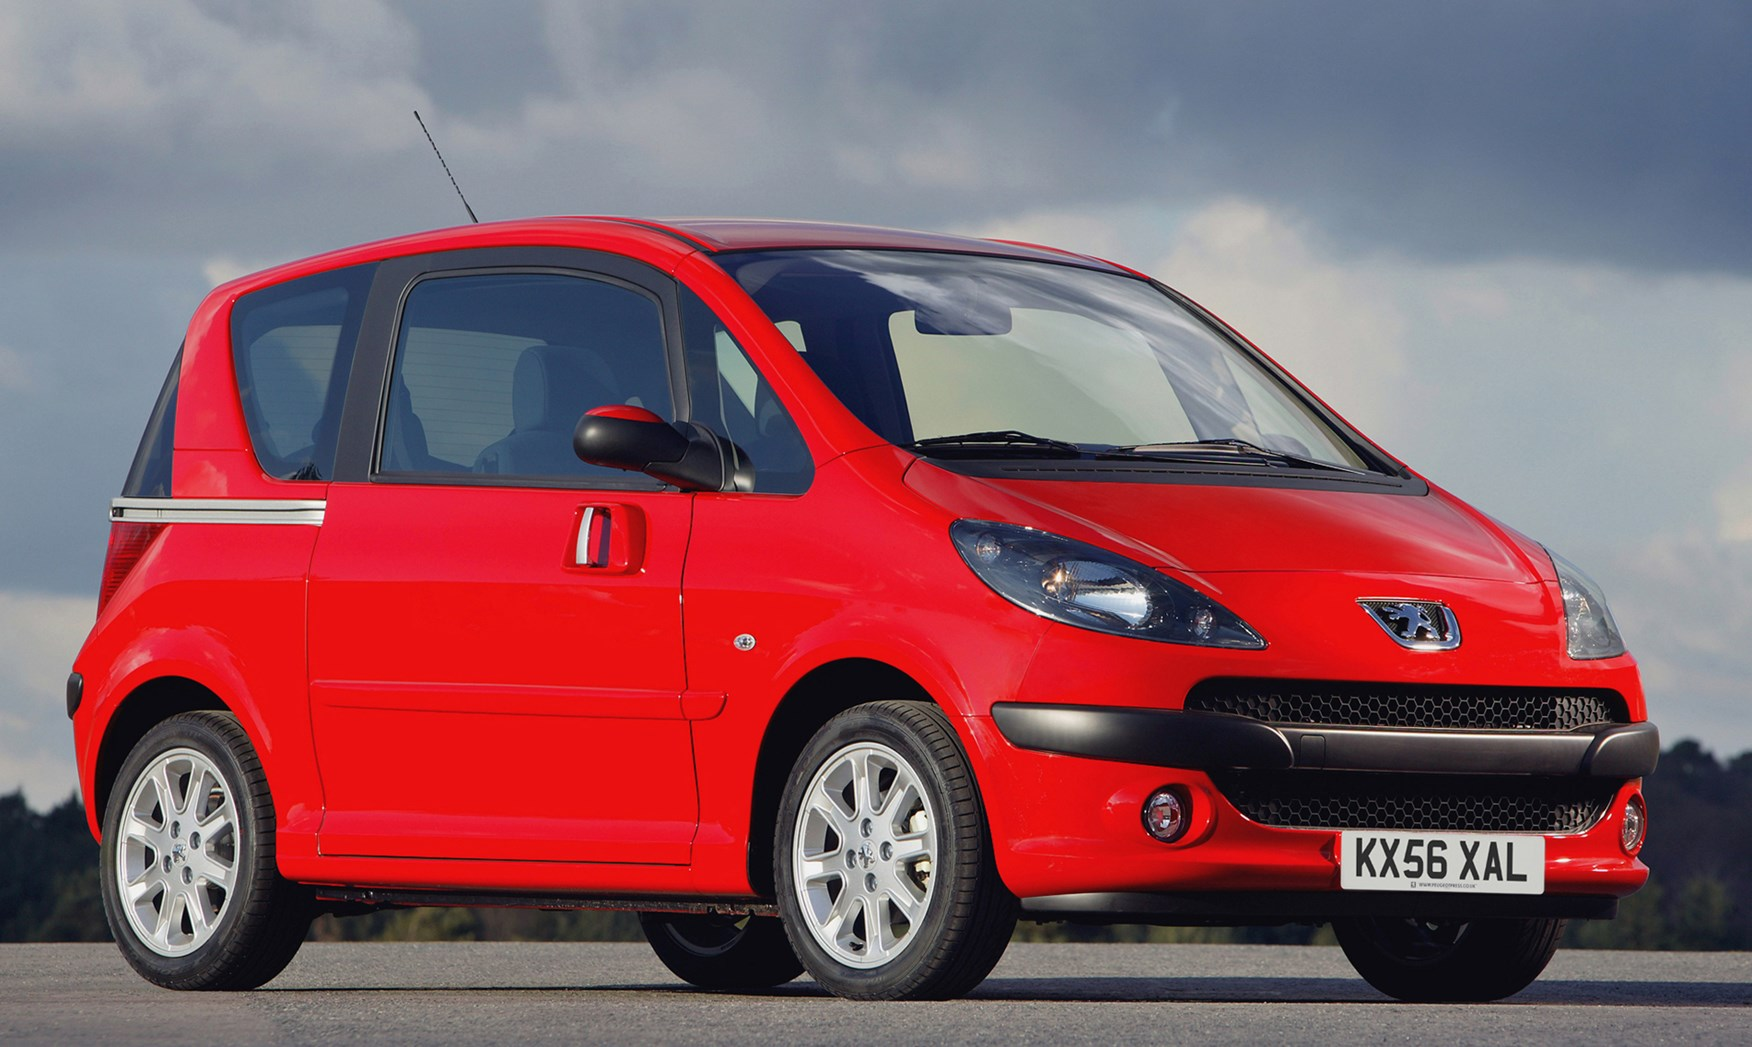 Peugeot 1007 Hatchback Review (2005 - 2009) | Parkers